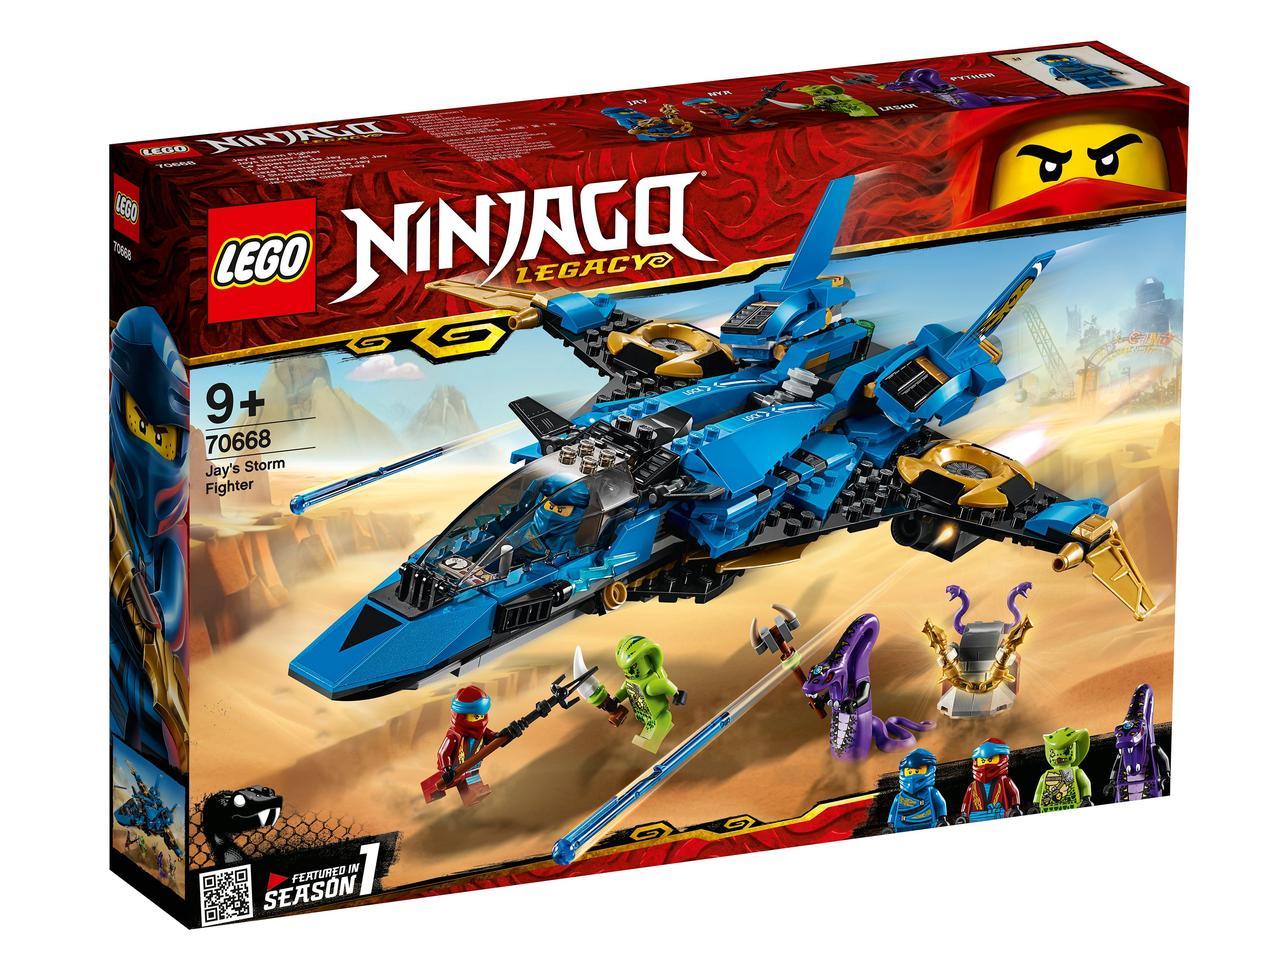 70668 Lego Ninjago Штормовой истребитель Джея, Лего Ниндзяго